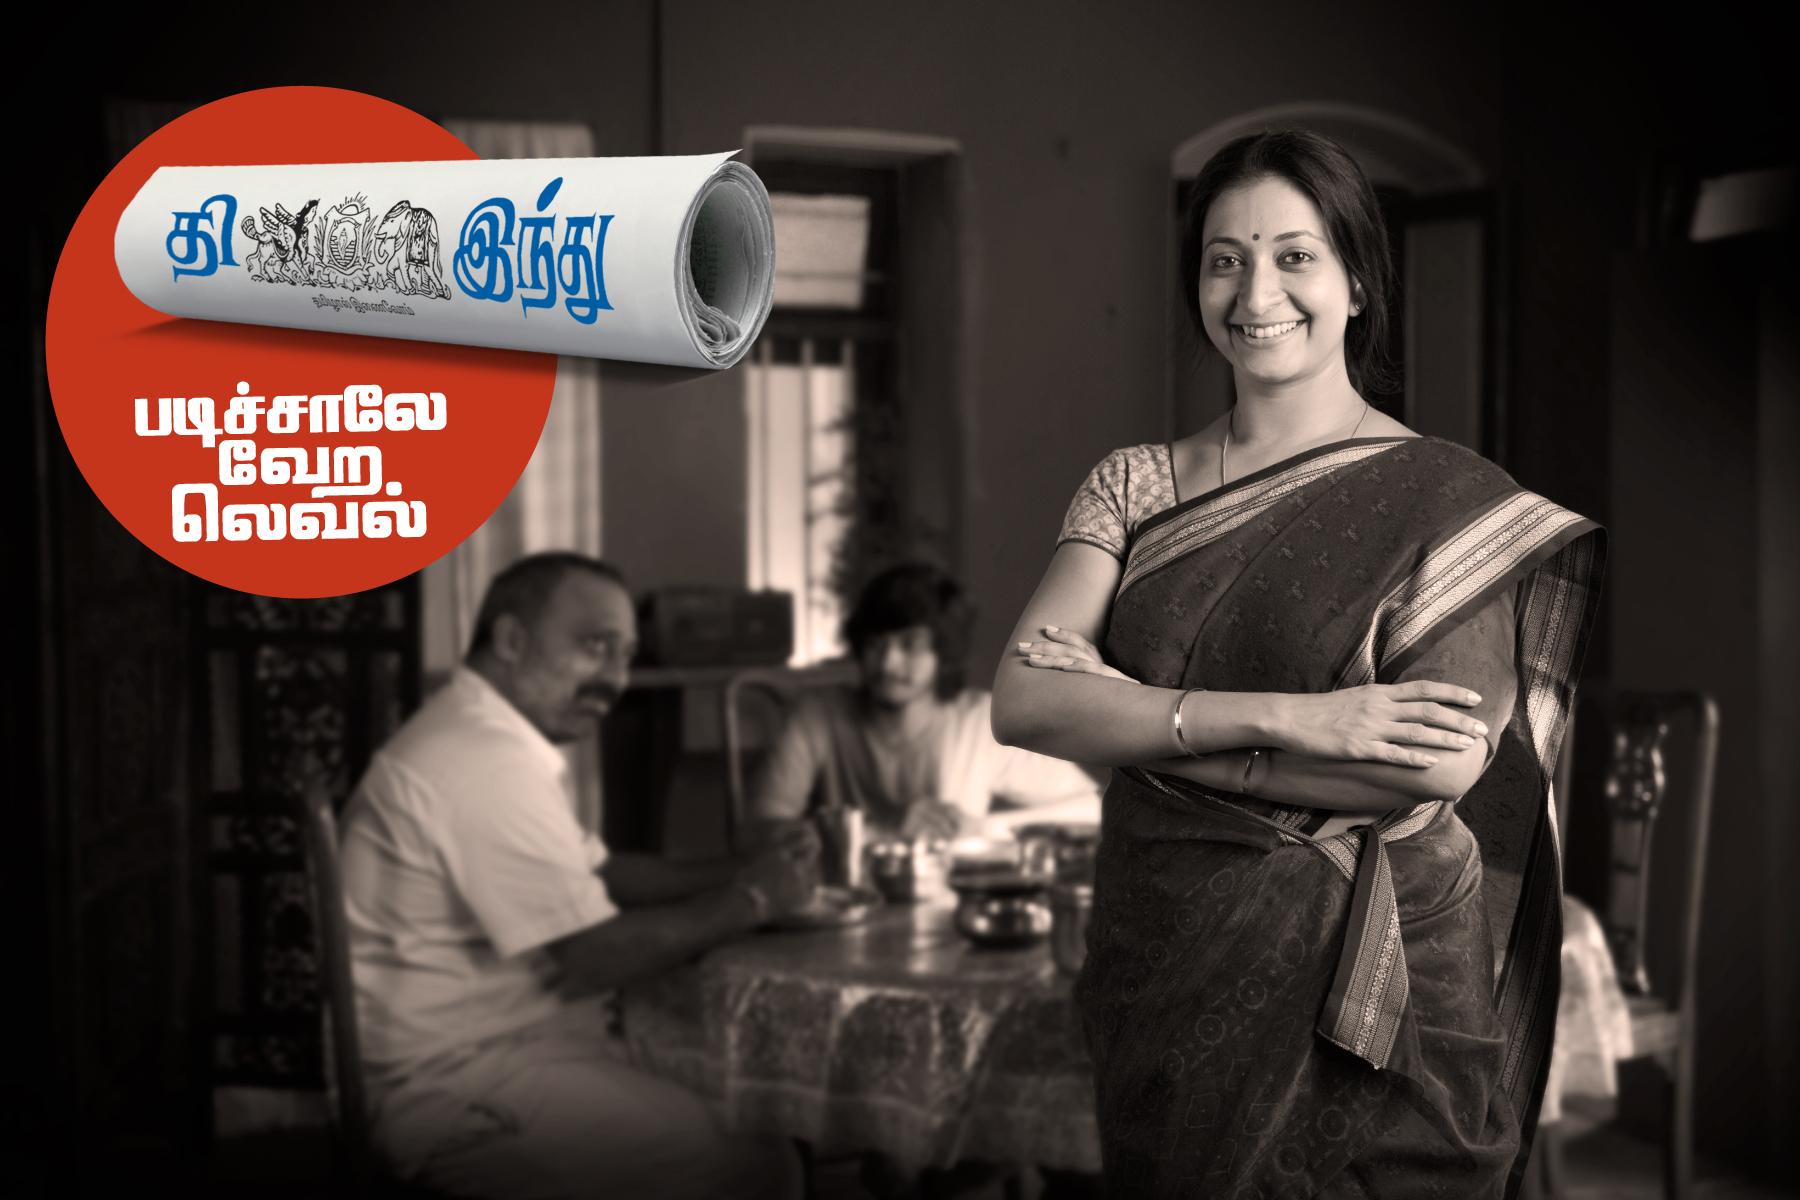 The Hindu Tamil 360 Degree Campaign